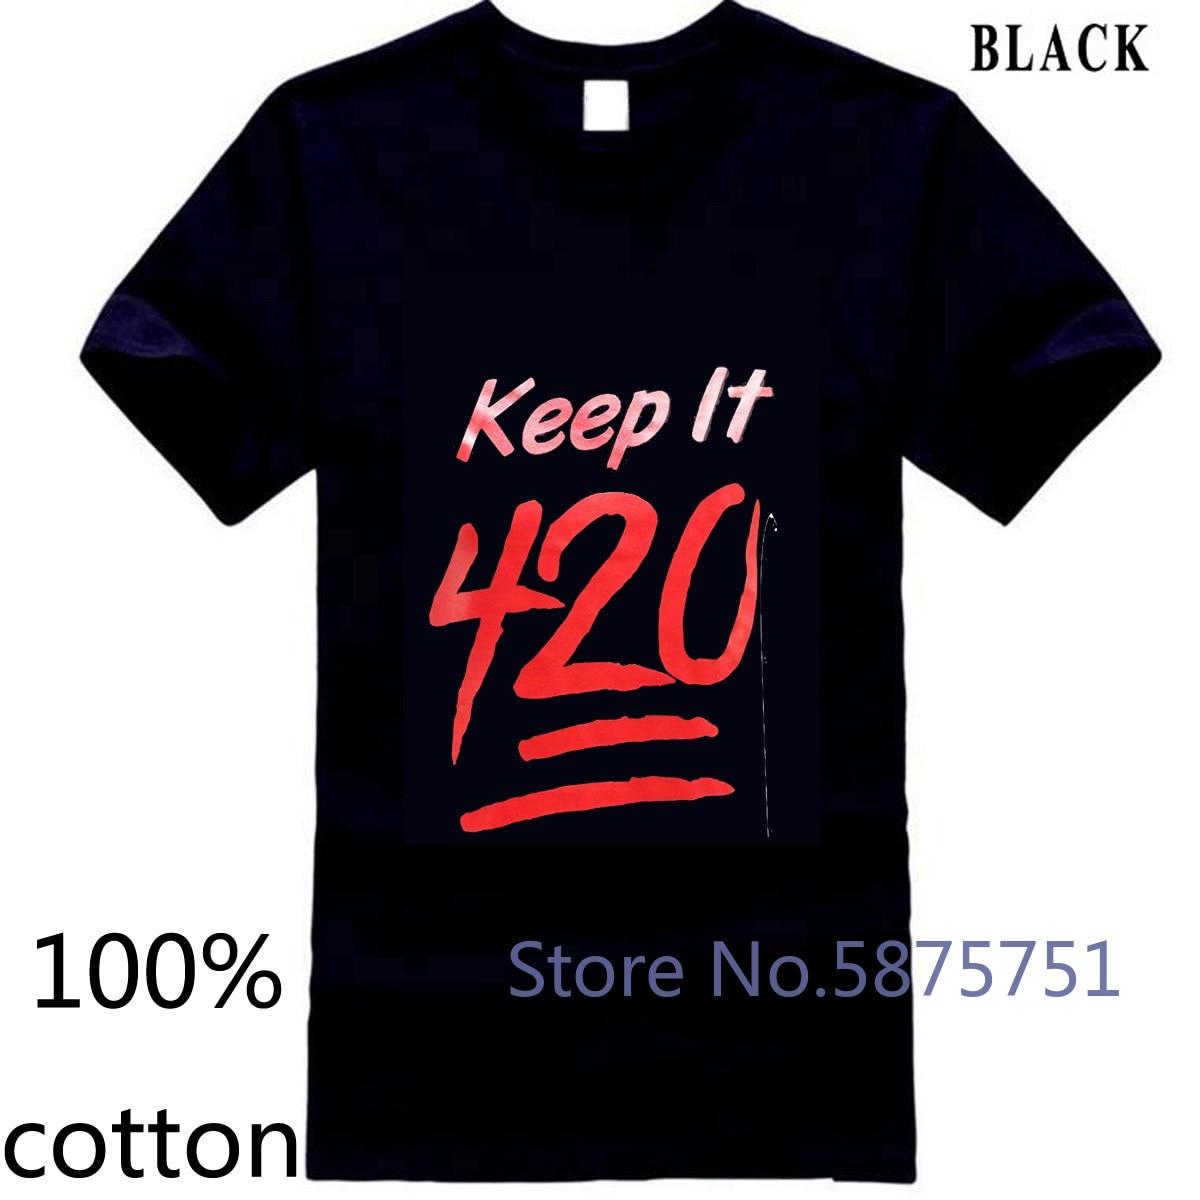 Halten Es 420 Topf Unkraut Stoner Männer der Neuesten Männer für Männer Stil Männer Lastest männer t shirt t-shirt tops tees 100% baumwolle